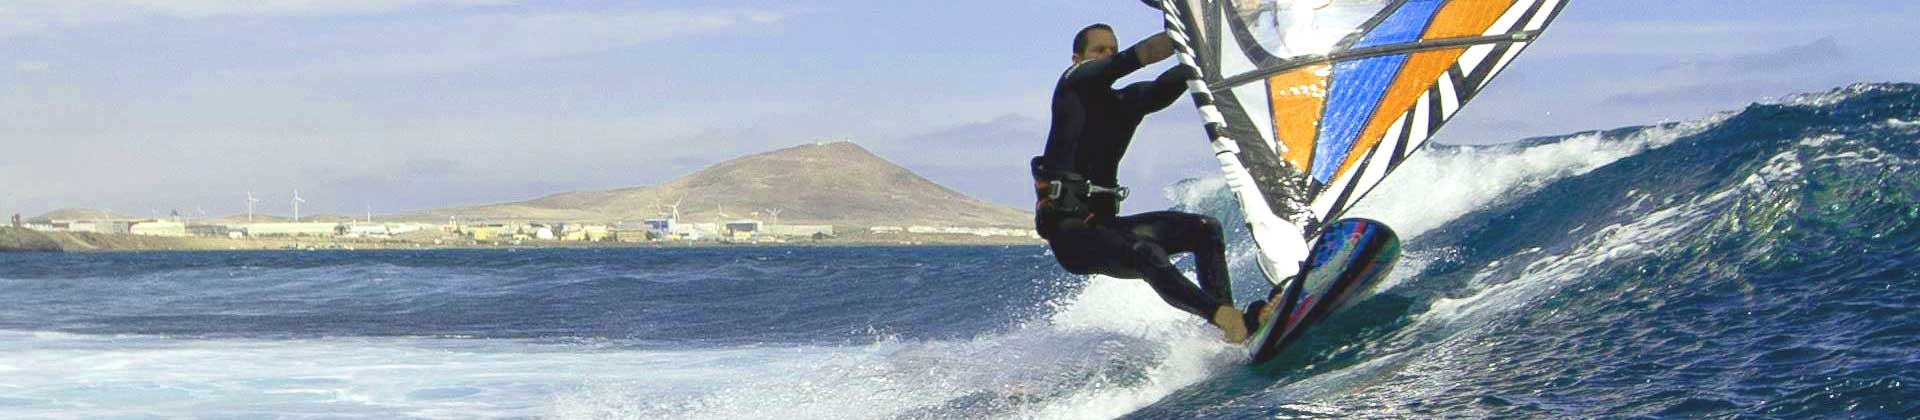 https://www.goodmorningtenerife.com/wp-content/uploads/2014/08/04_slide_windsurfing_GM_Tenerife.jpg